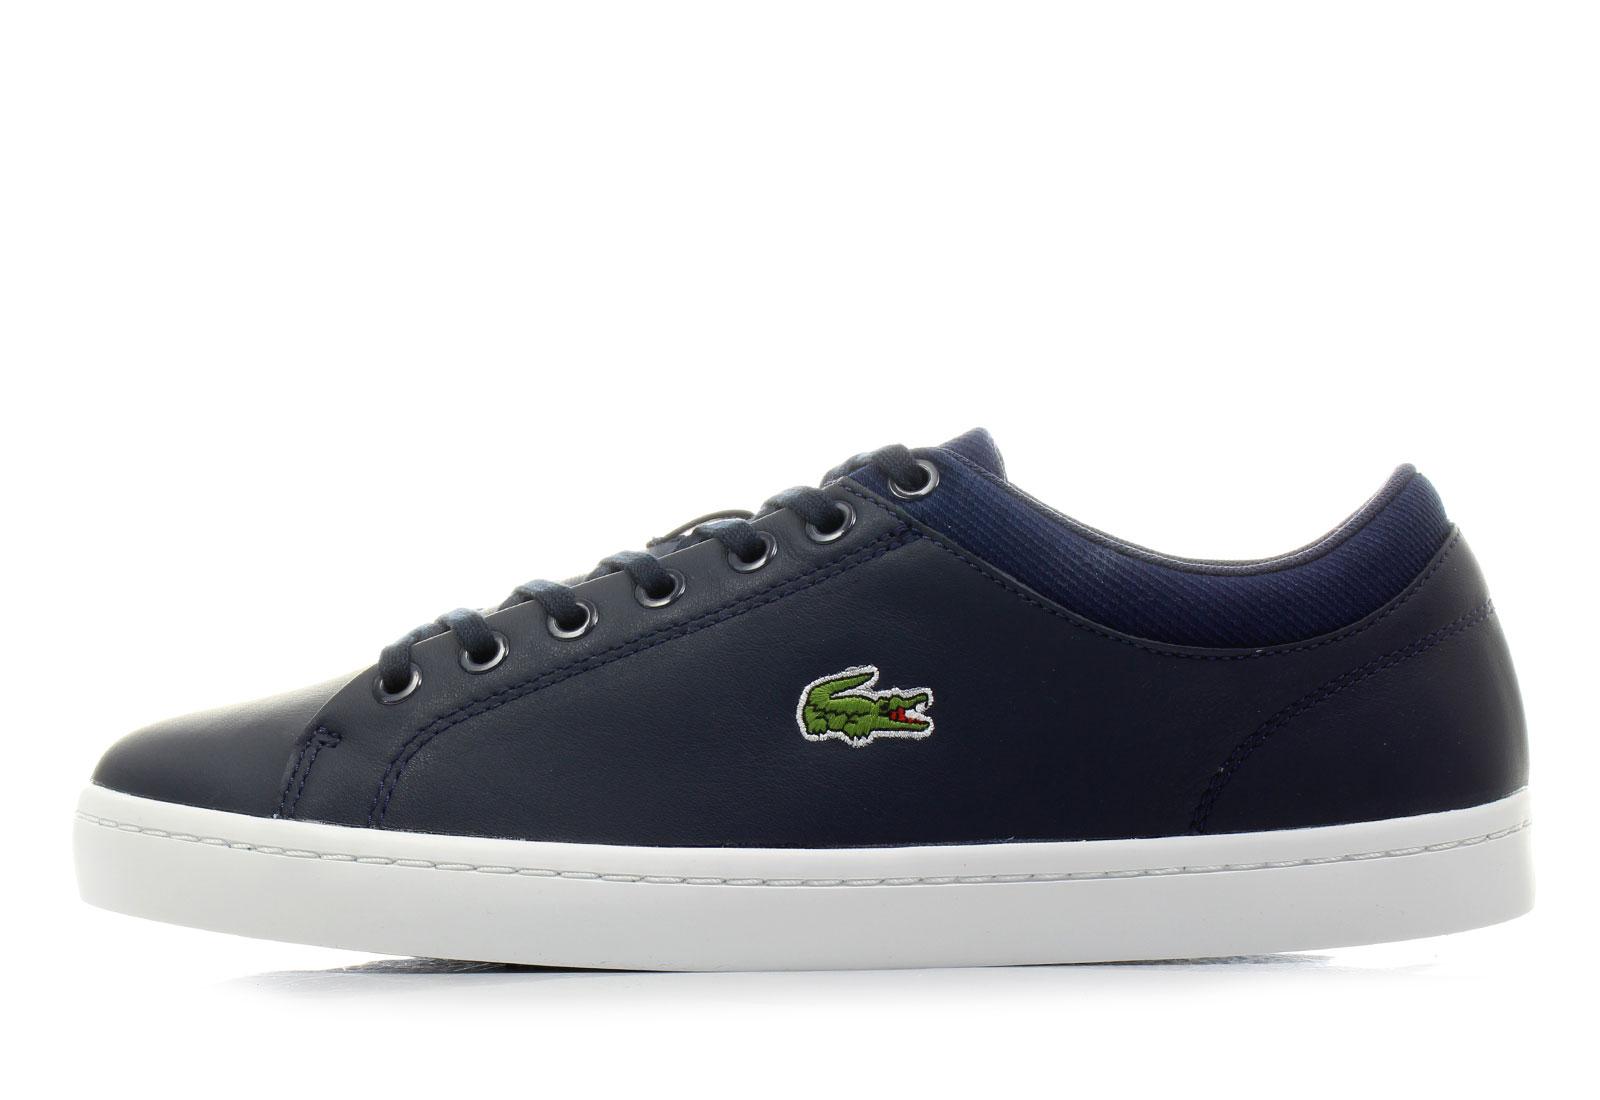 lacoste shoes straightset sport lthr 161spm0035 003